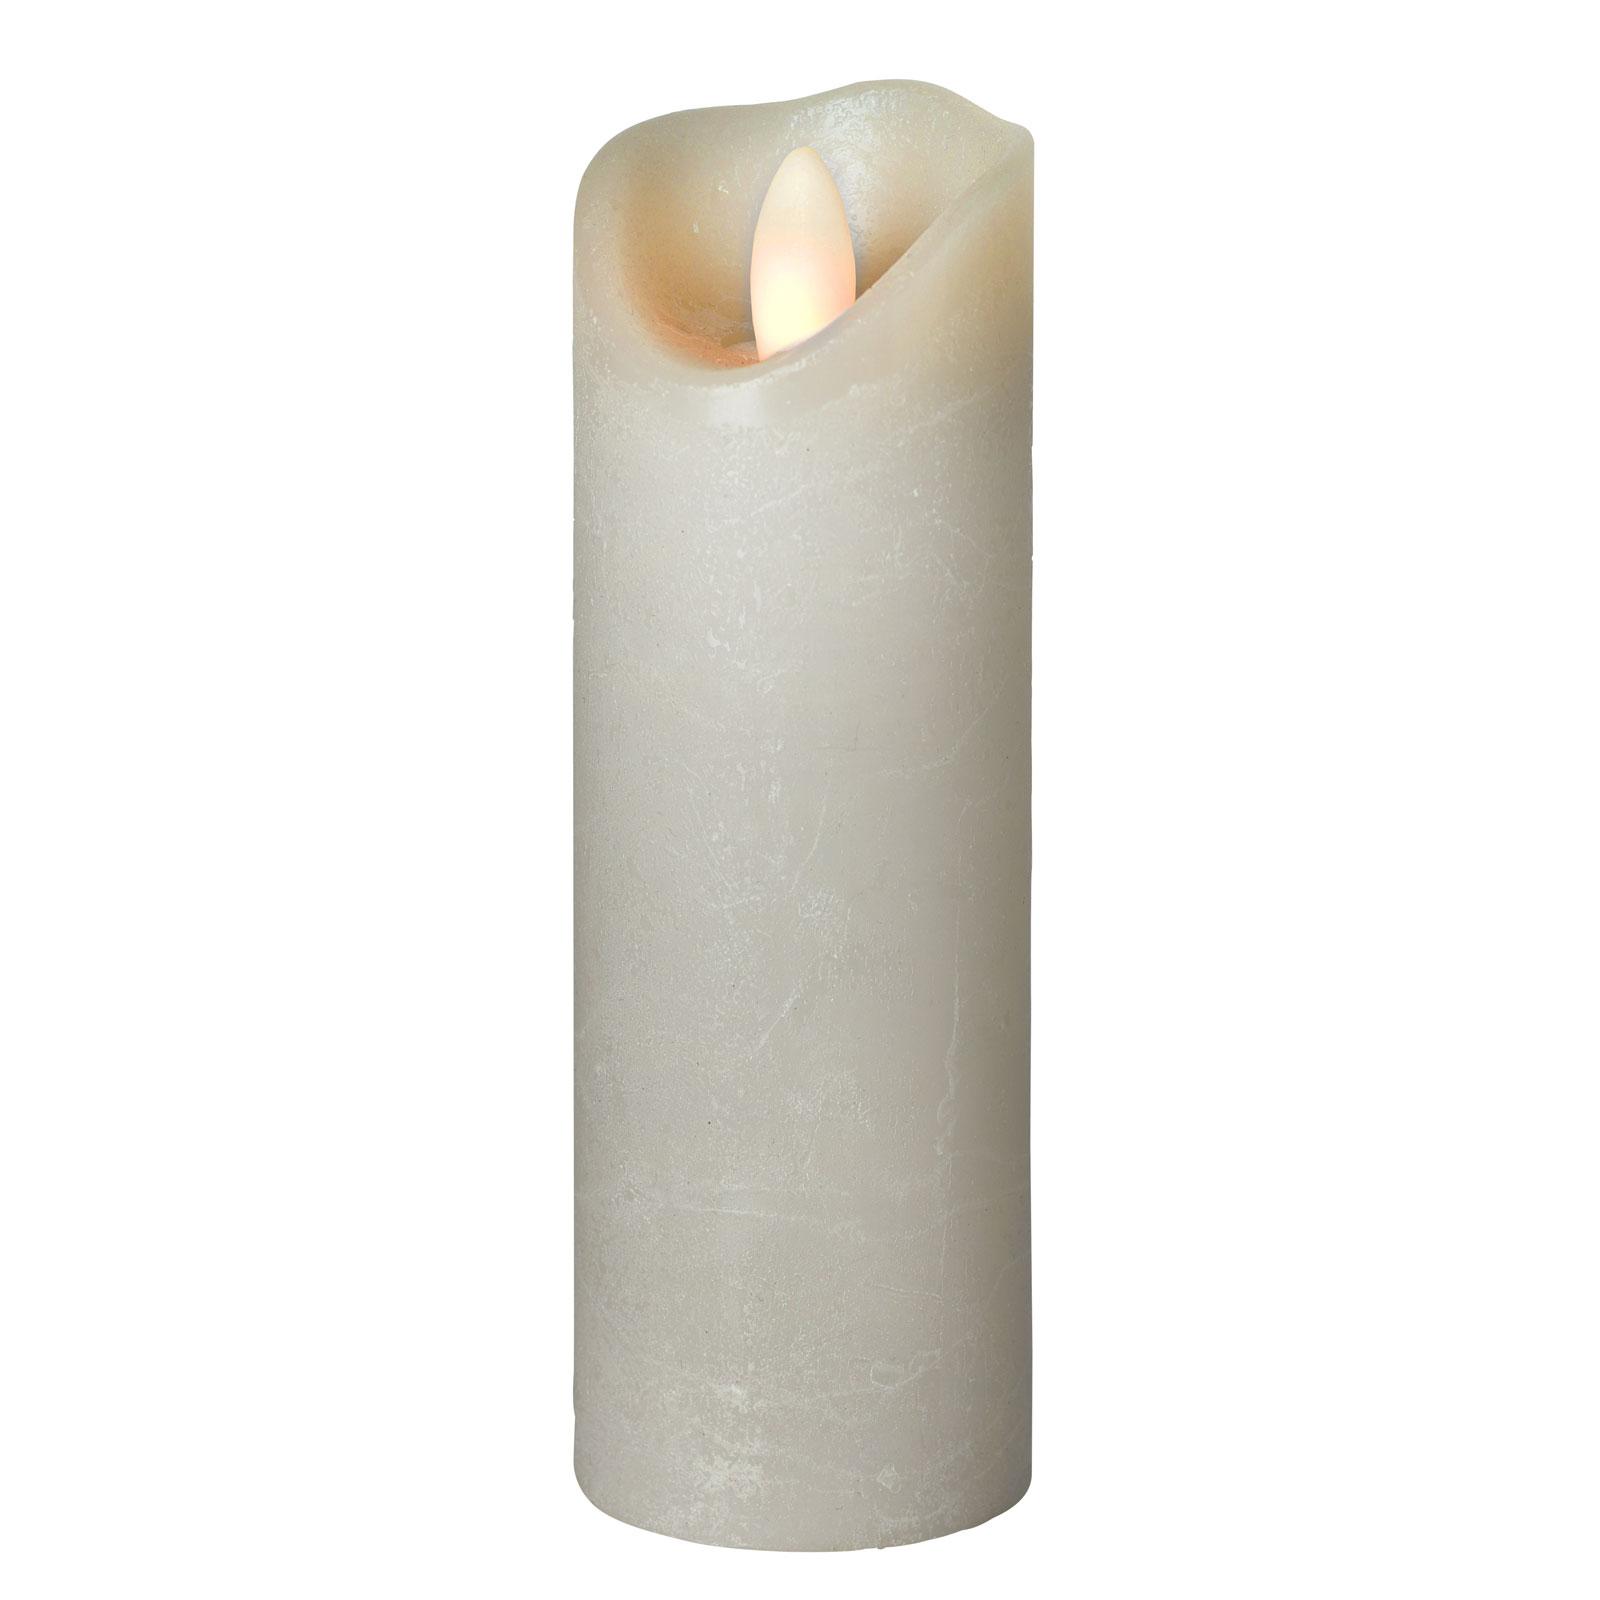 LED-kynttilä Shine, Ø 5 cm, harmaa, 17,5 cm